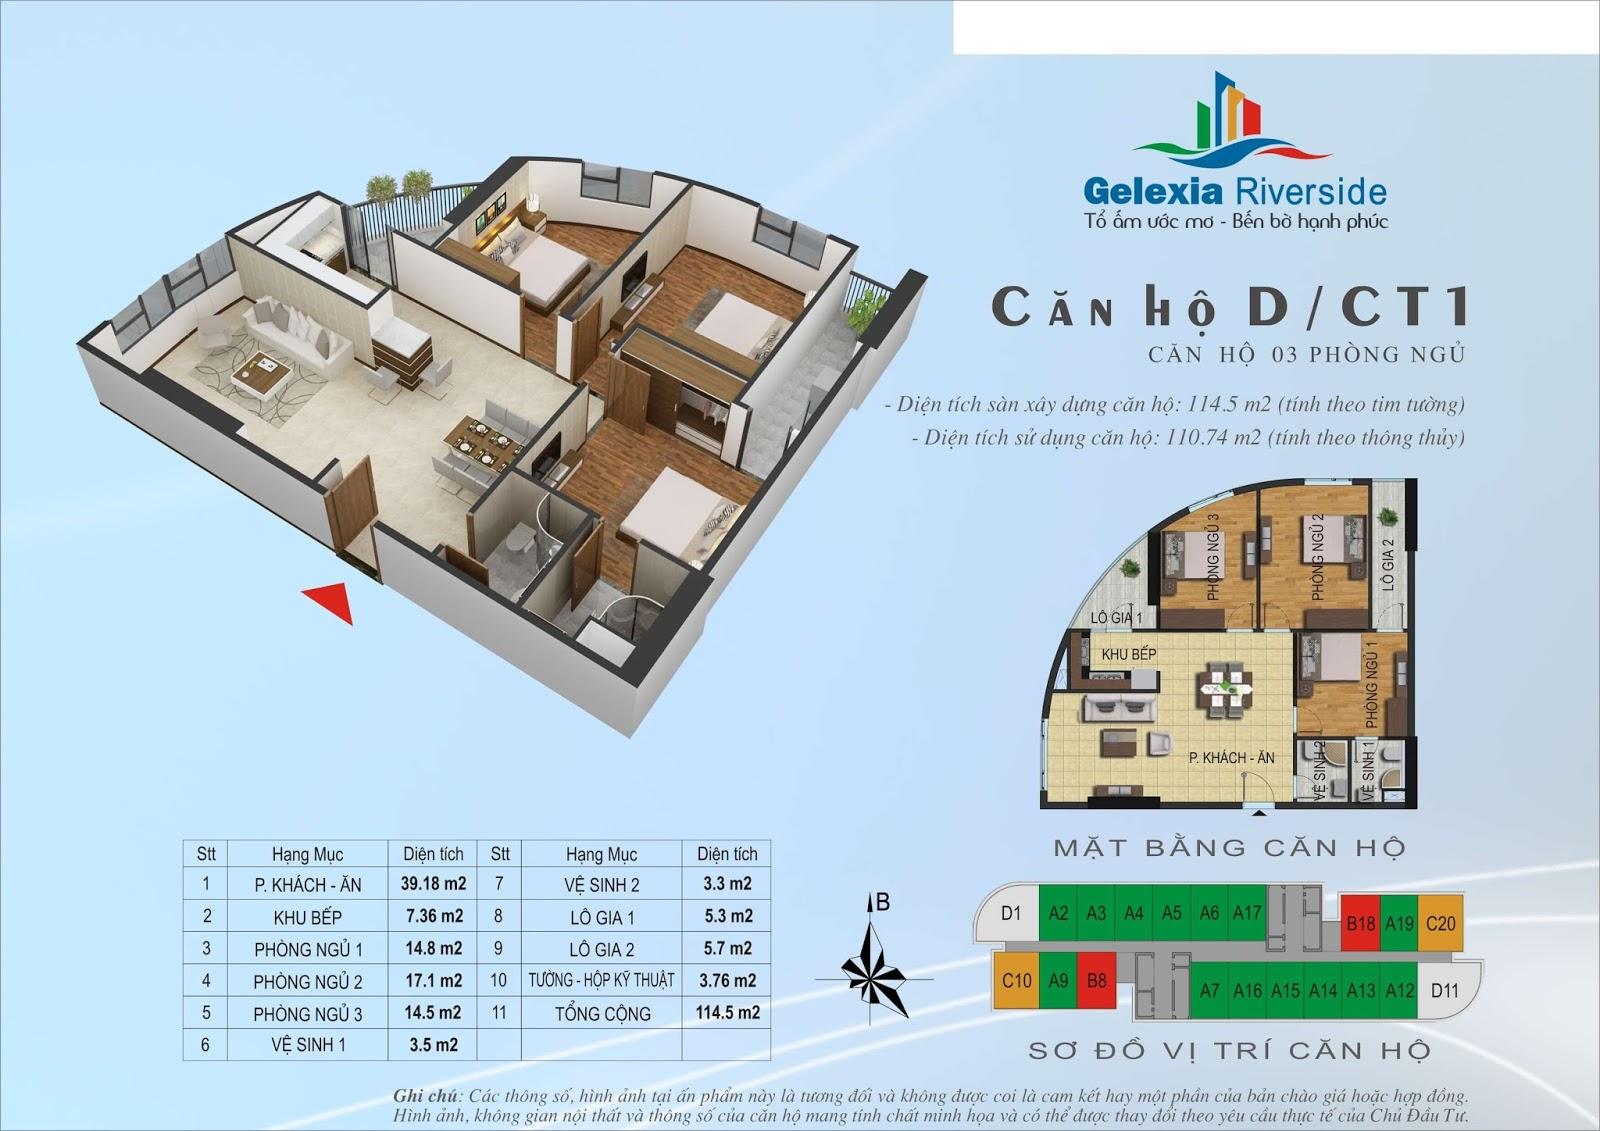 Mặt bằng căn hộ 114,5 m2 tòa CT1 - Gelexia Riverside